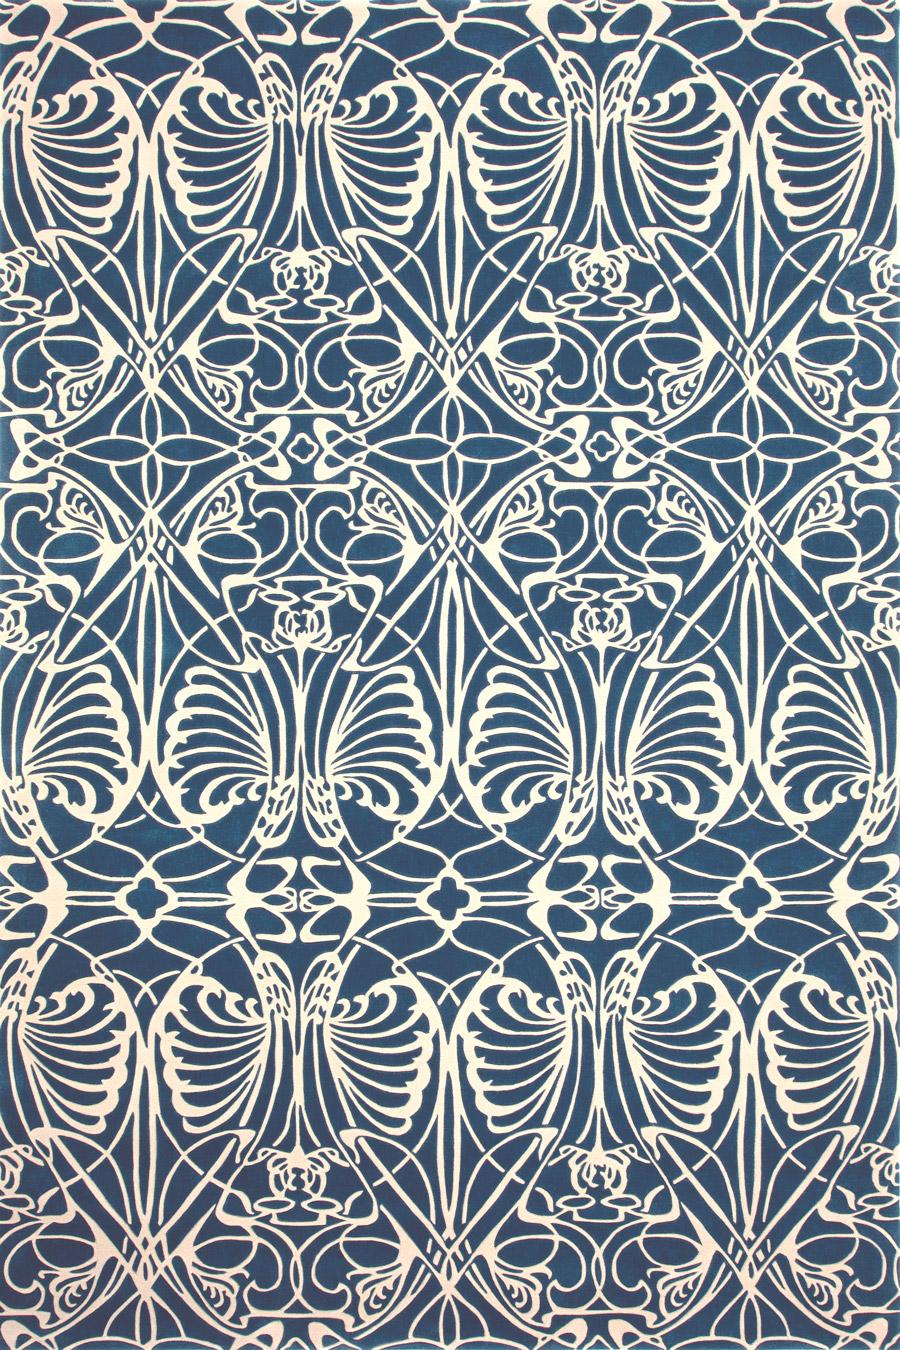 Overhead image of art nouveau Metropolitan rug in blue colour